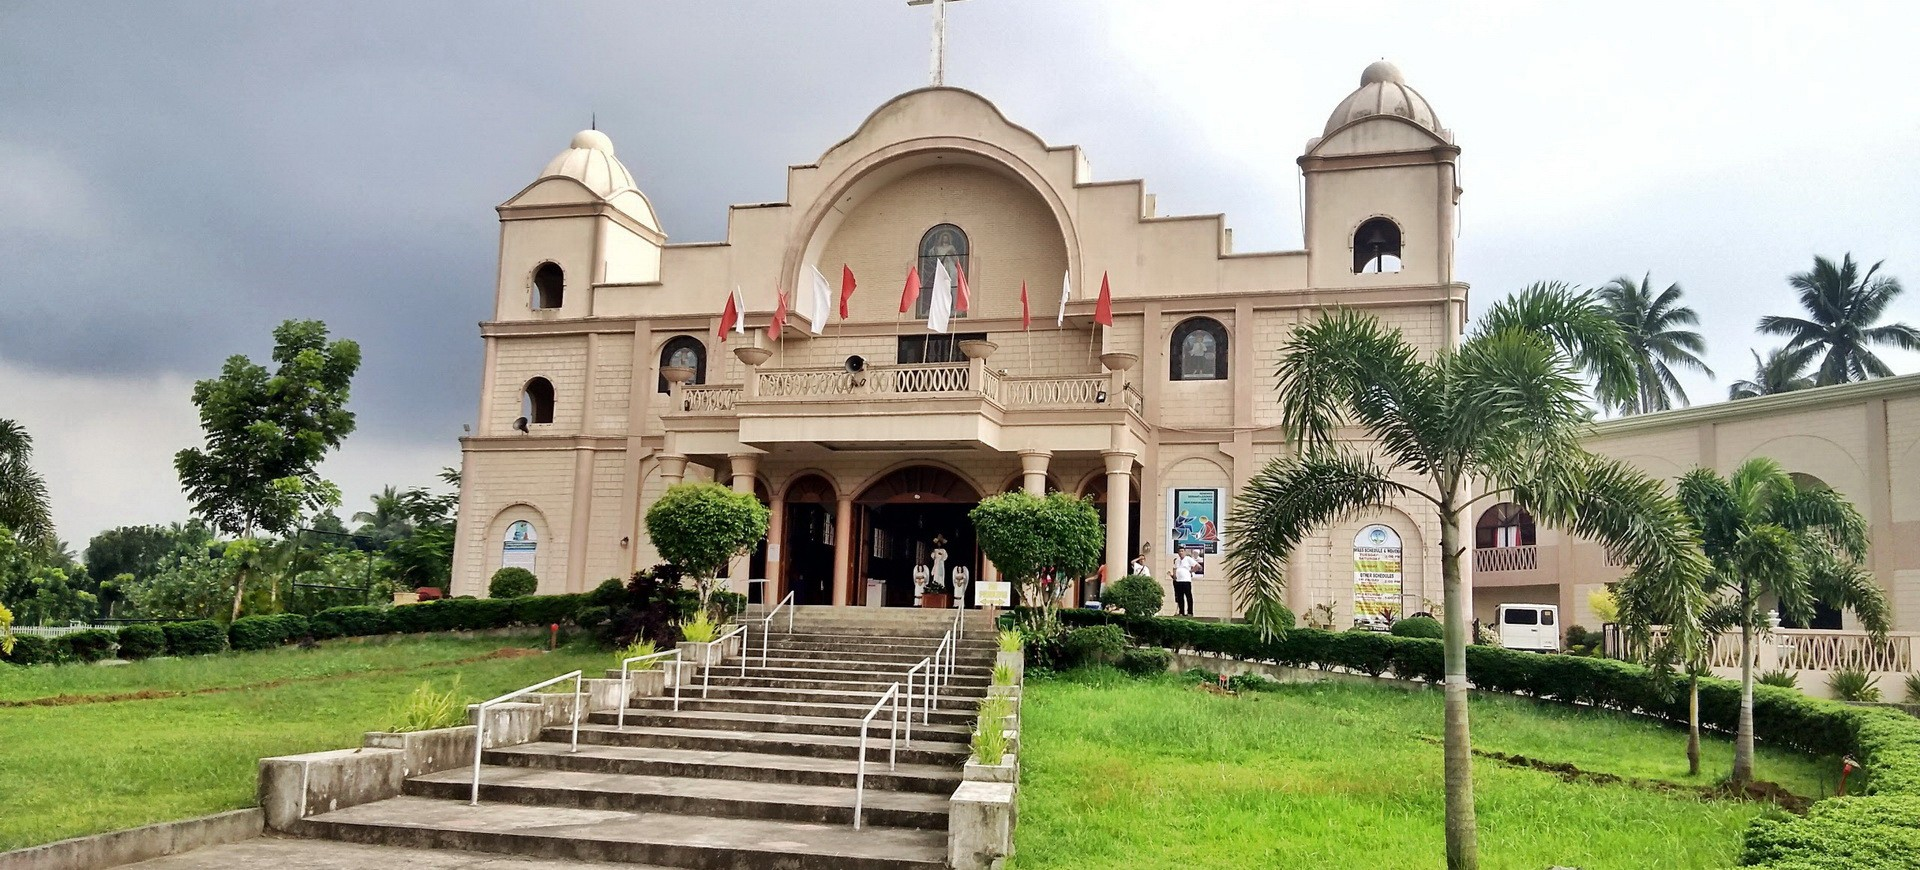 Eglise à Manille